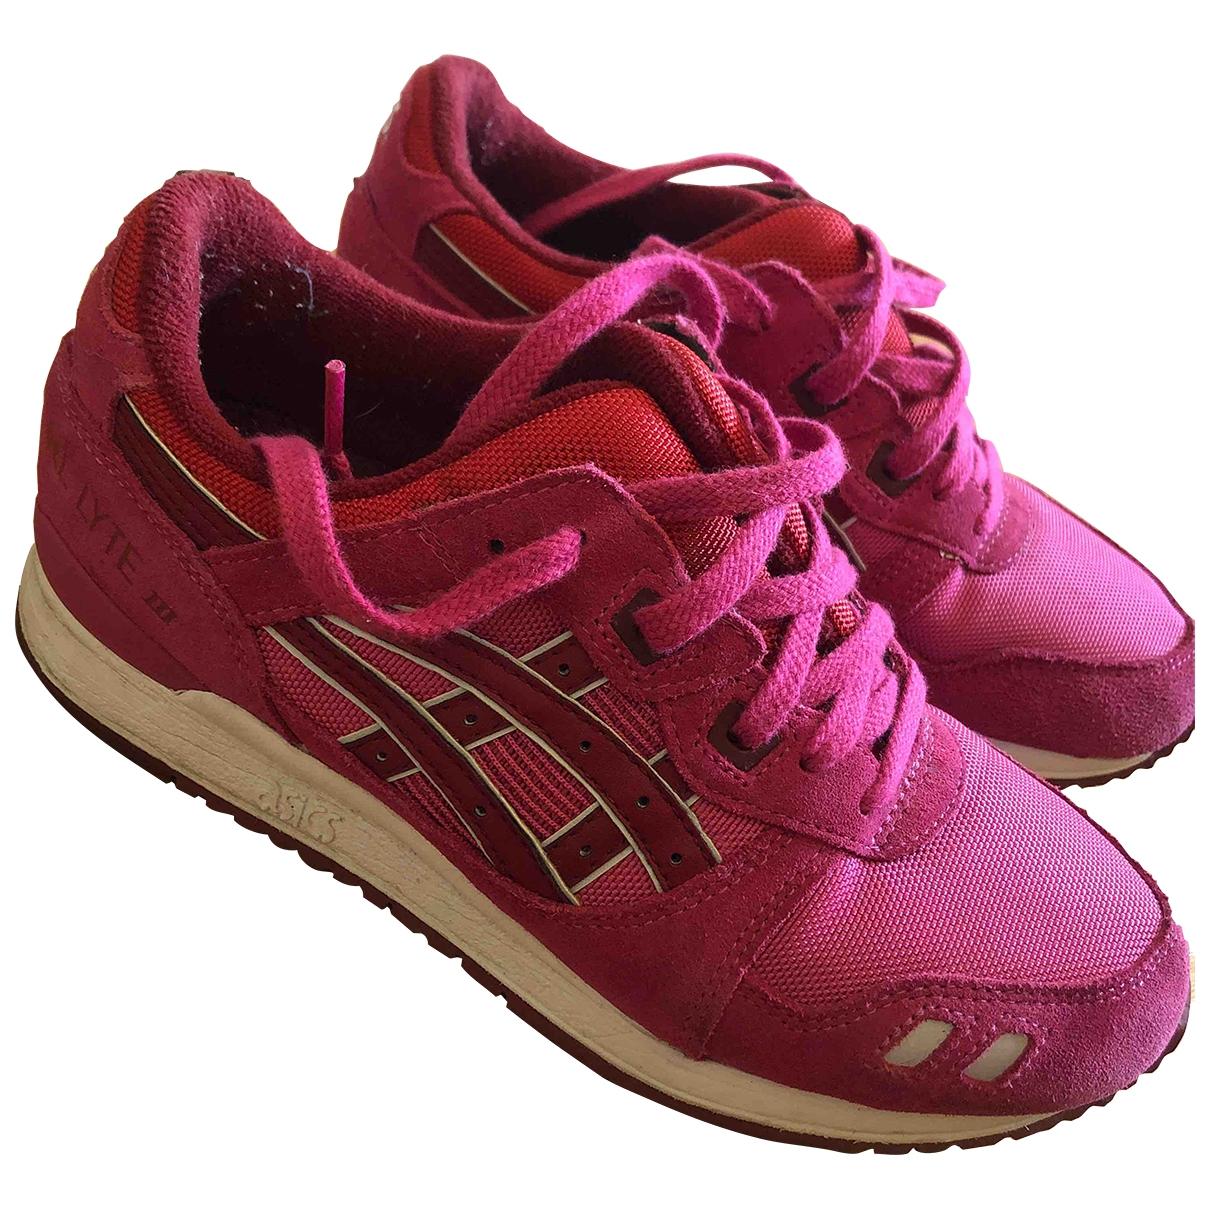 Asics - Baskets   pour femme en suede - rose